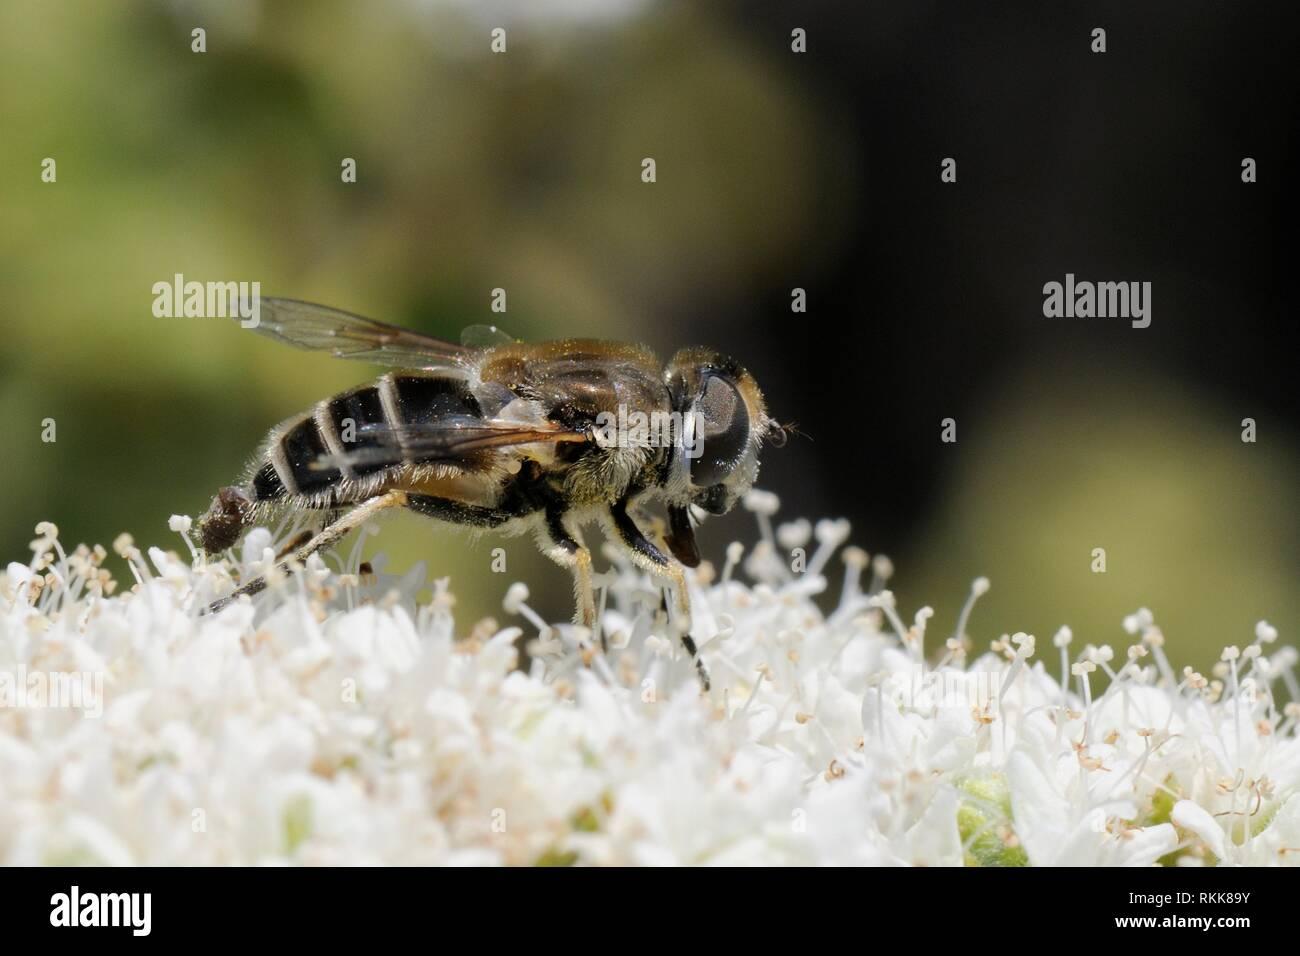 Hover-fly (Eristalis arbustorum) Beschickung von kretischer Oregano (Origanum onites), Lesbos/Lesbos, Griechenland, Mai. Stockfoto